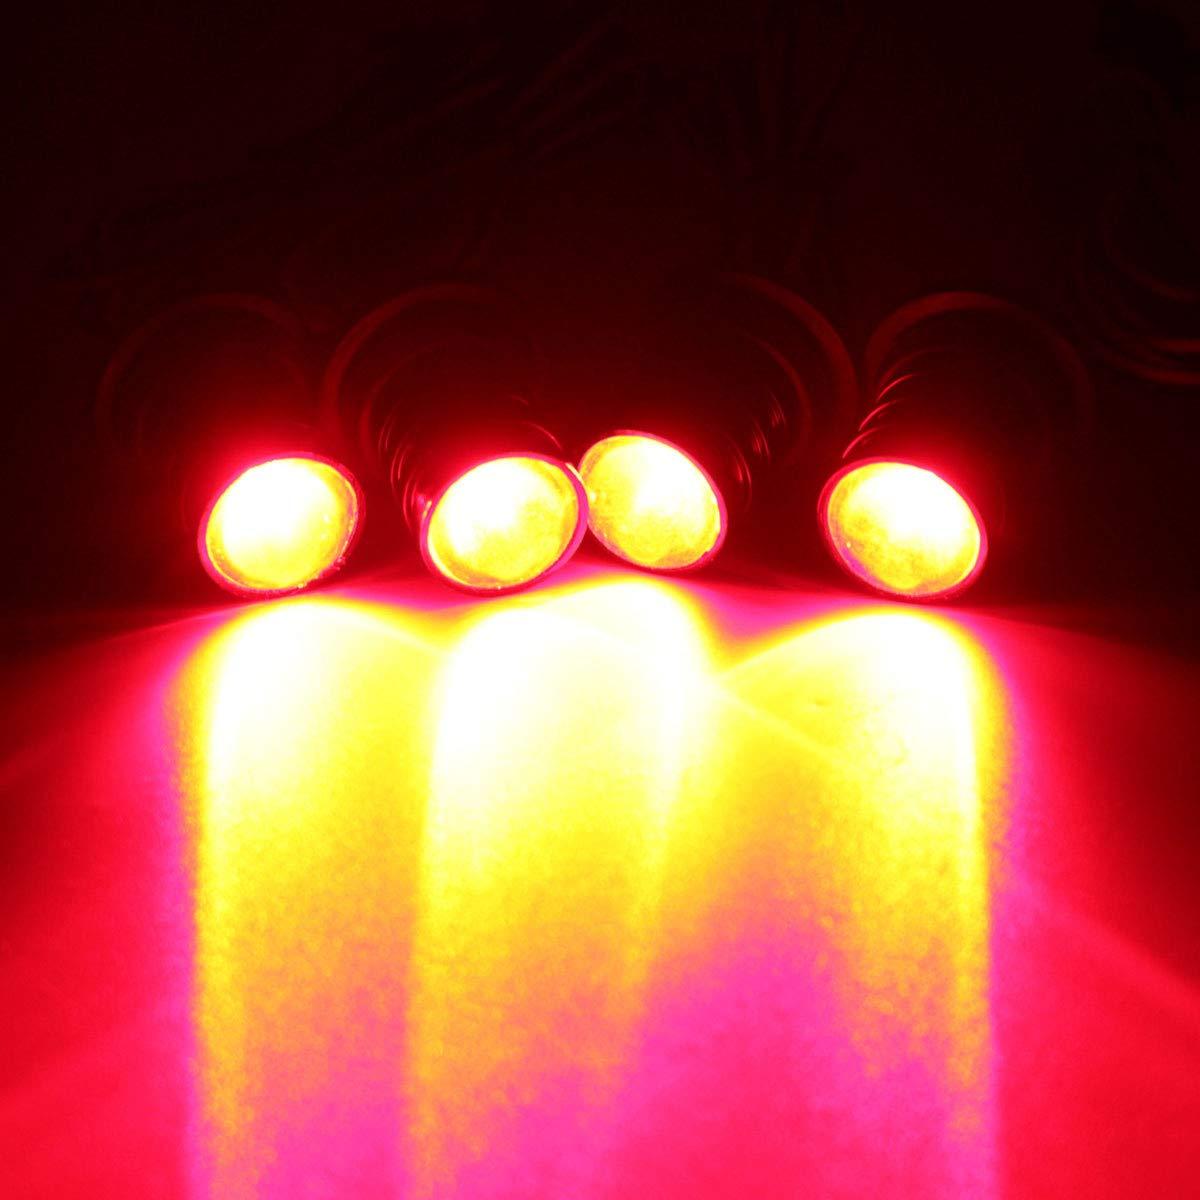 Fincos Universal Remote Control Car 4 LED Strobe Flashing Hazard Emergency Warning Light - (Color: Blue)